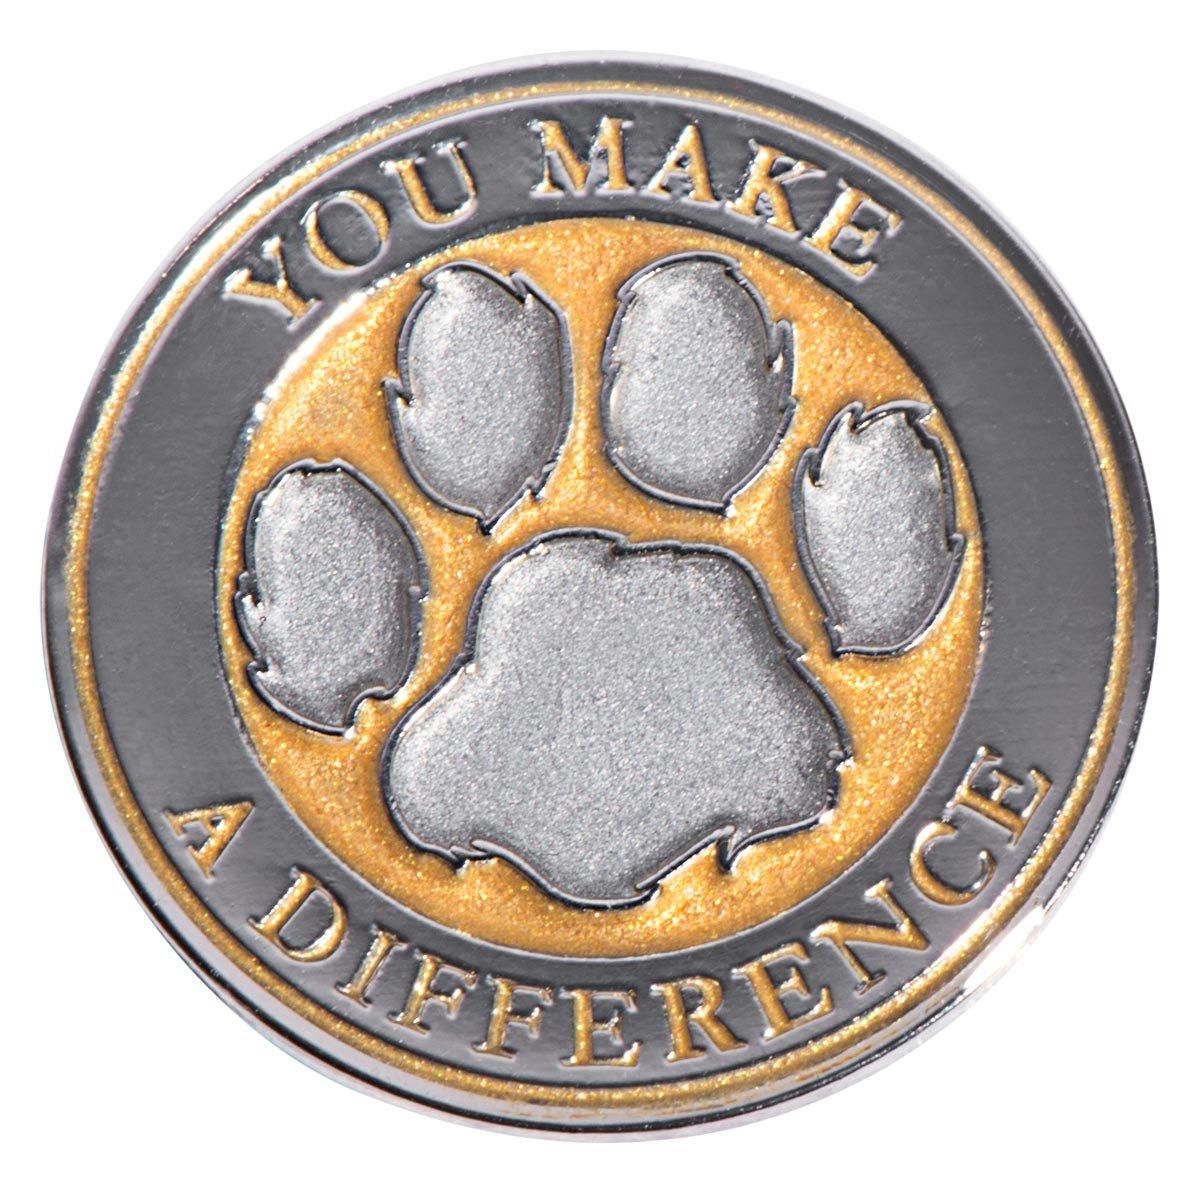 You Make a Difference Gold Appreciation Award Lapel Pins, 12 Pins